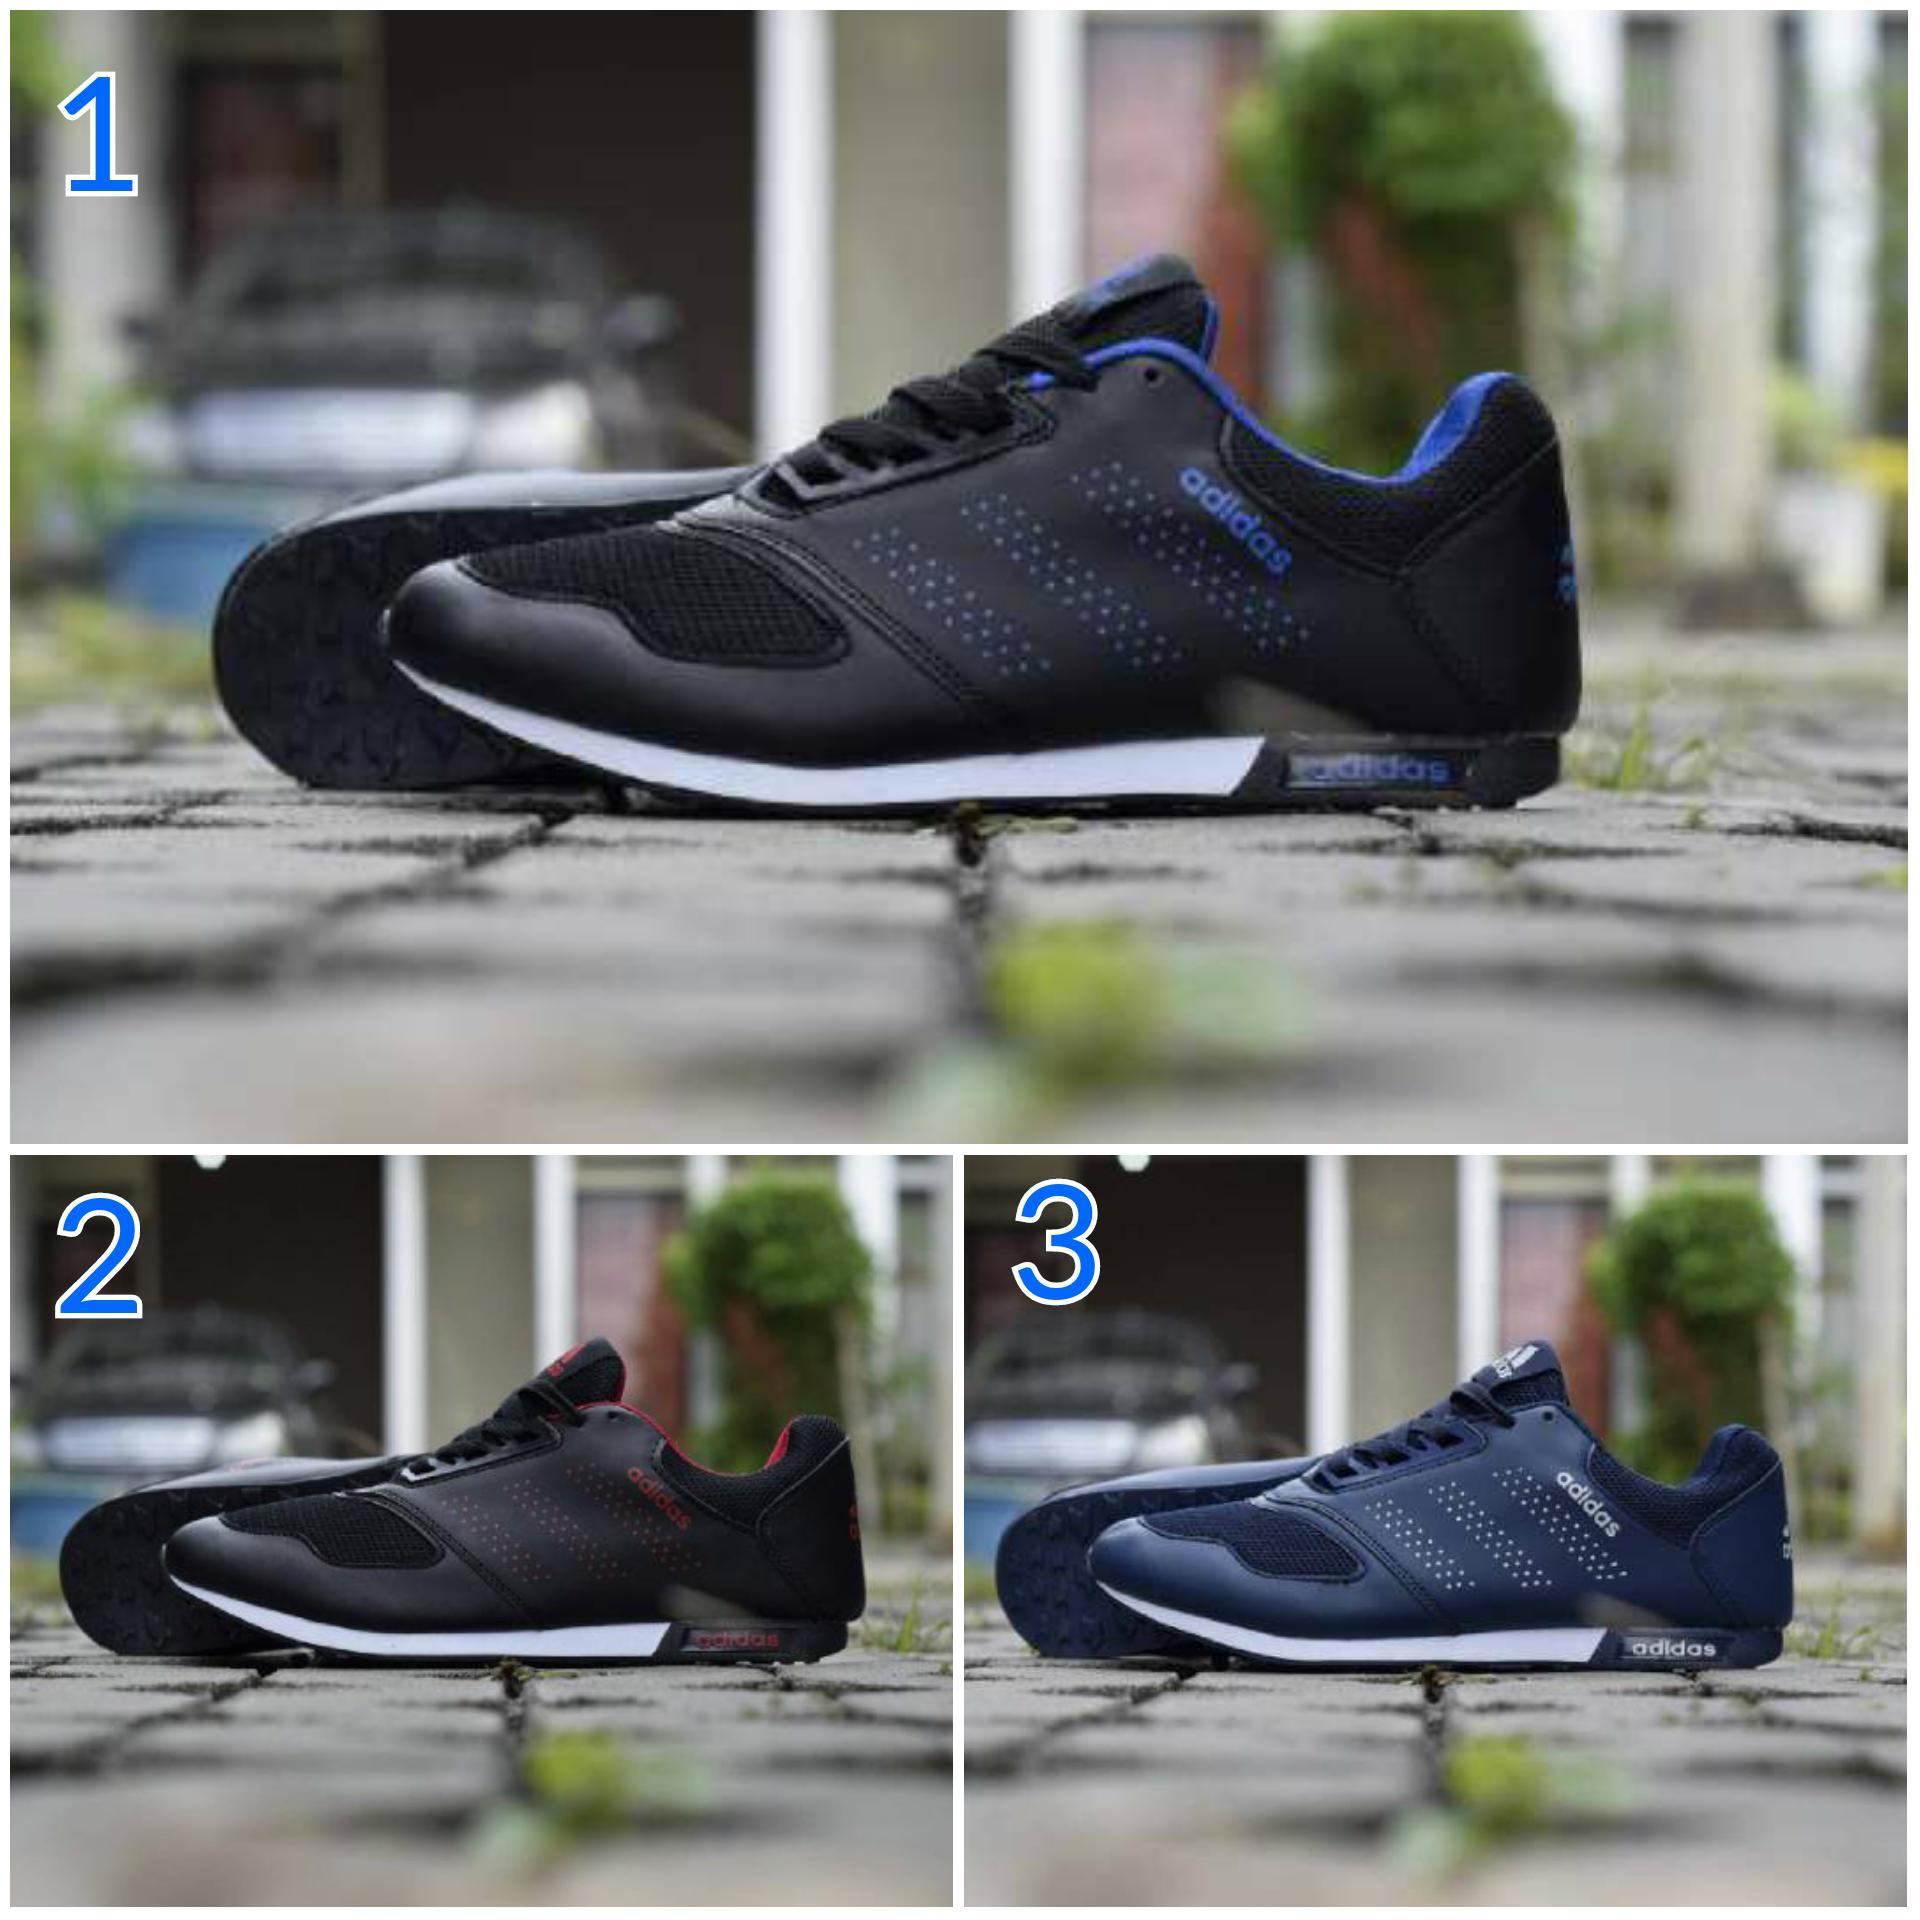 Promo Sepatu Adidas Ultra Boost Men Original Vietnam Sepatu Pria Diskon